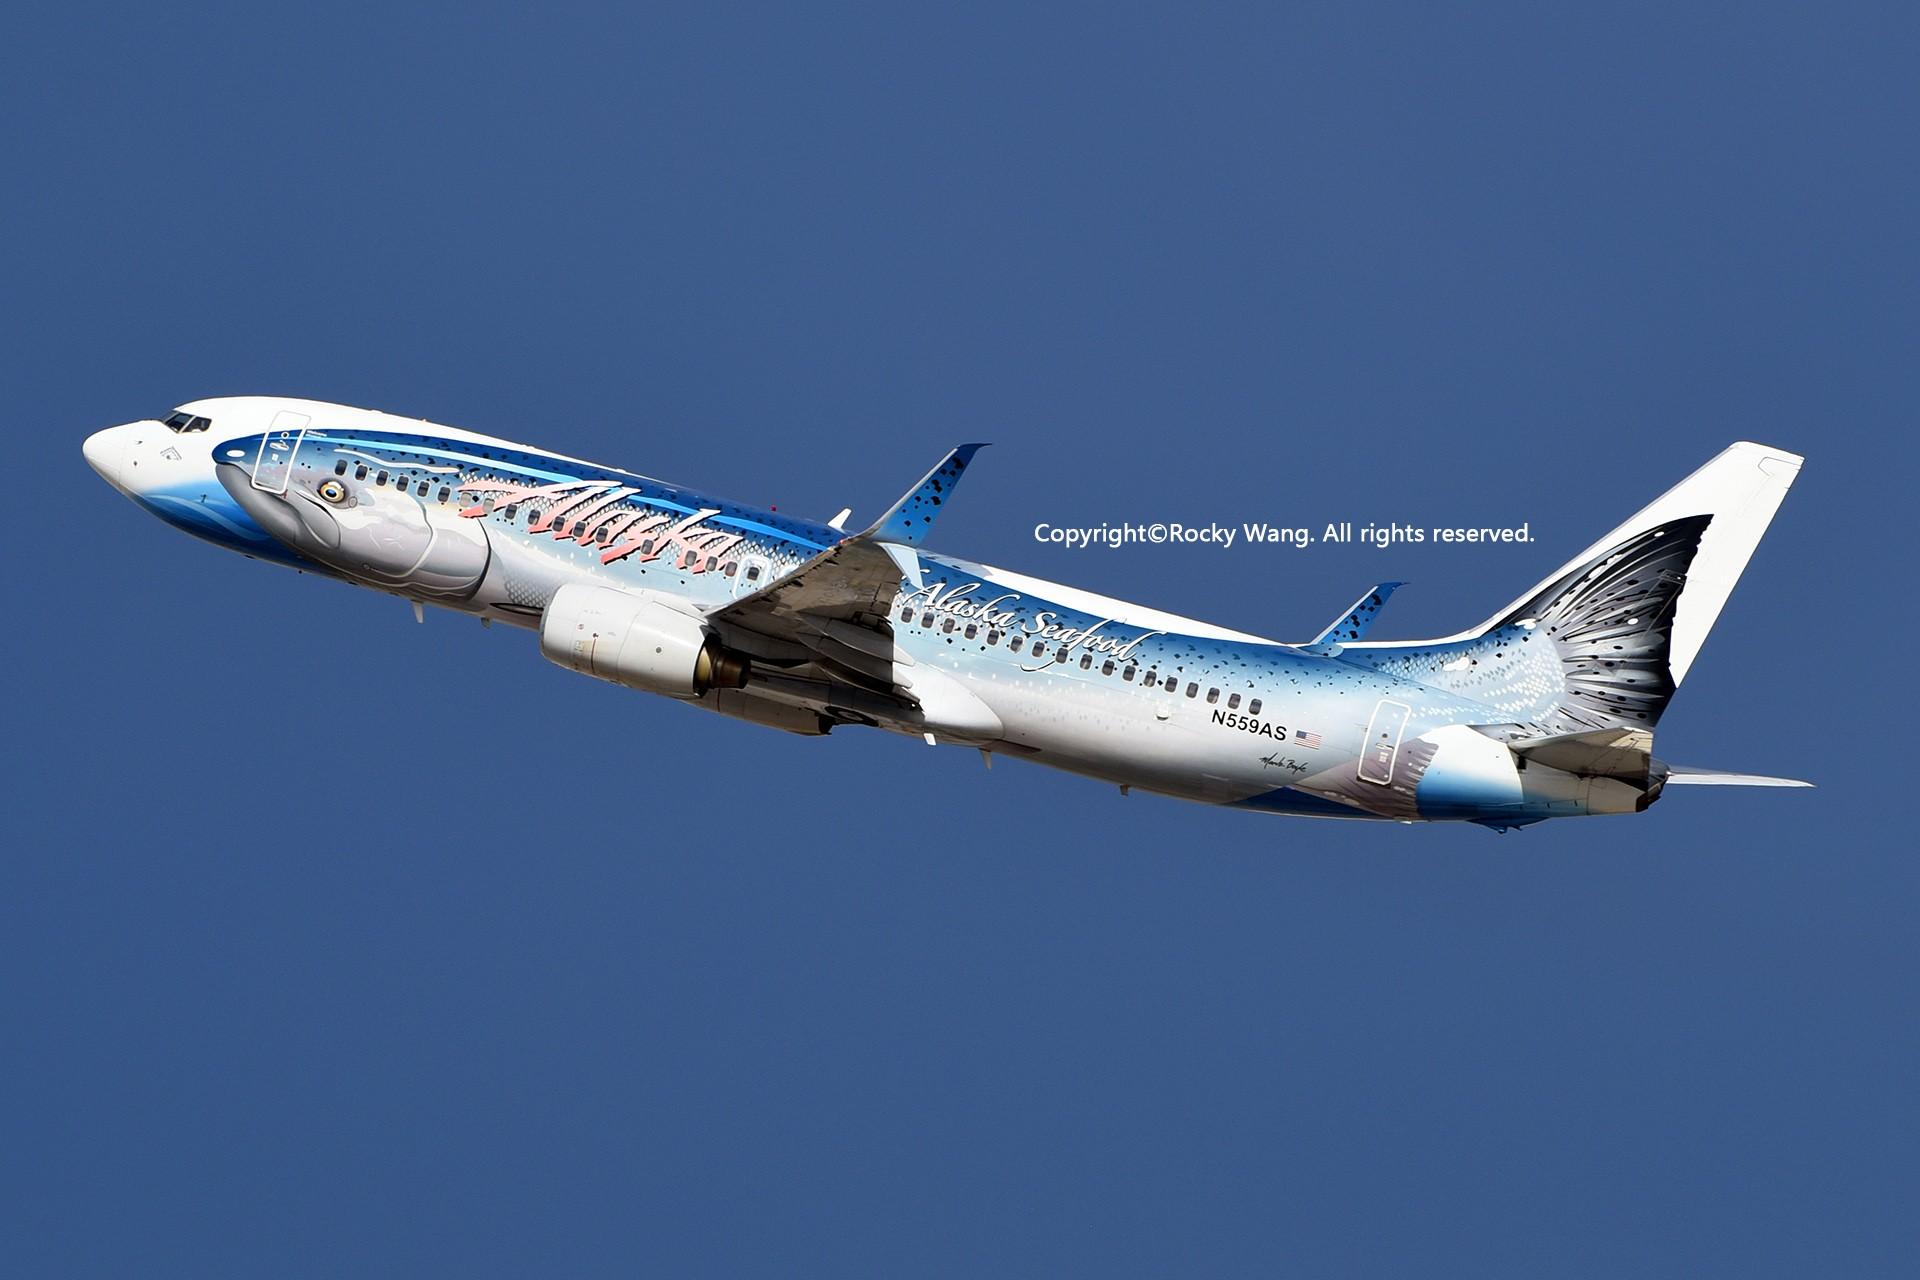 Re:[原创]彩绘圣地-附加彩蛋 BOEING 737-890 N559AS Los Angeles Int'l Airport